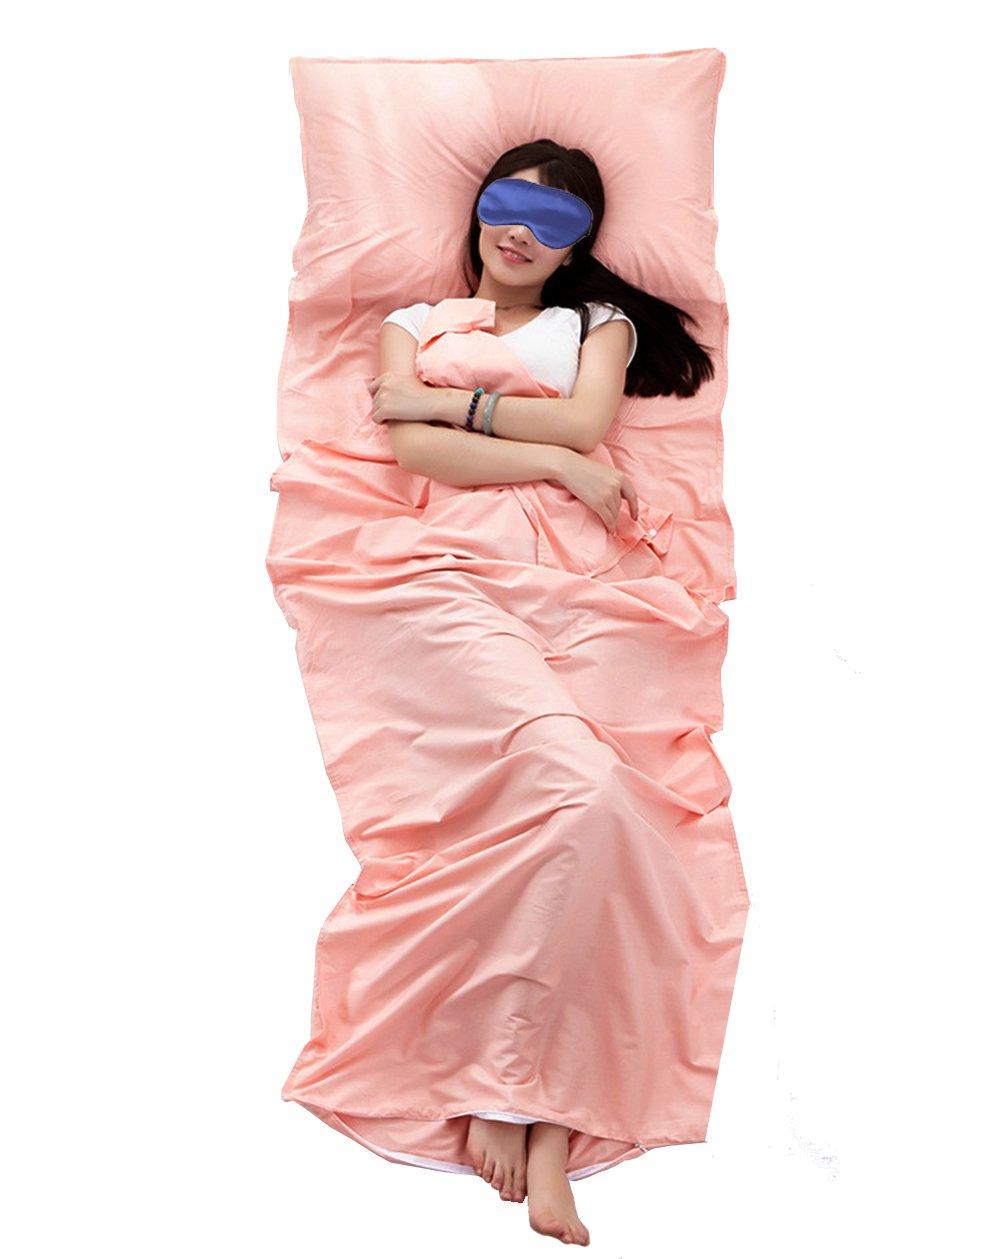 Share Maison 100% Cotton Sleeping Bag Liner Travel Sheet Camping Sleep Sheet Single/Double (Light Pink, 87''x71'') by Share Maison